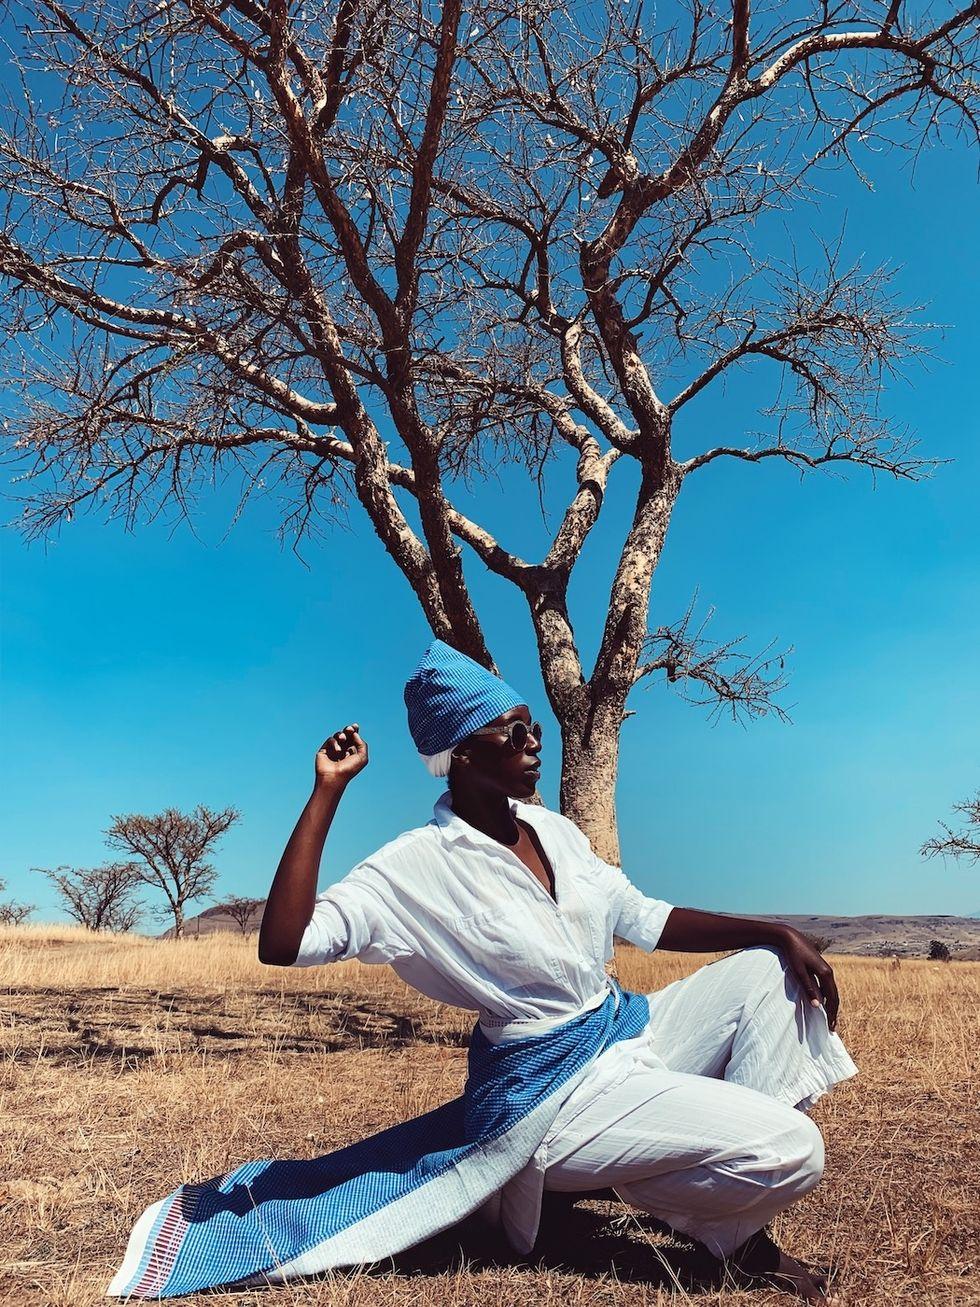 The photographer's cousin, Ayanda Seoka in Estcourt, KwaZulu Natal in 2020.